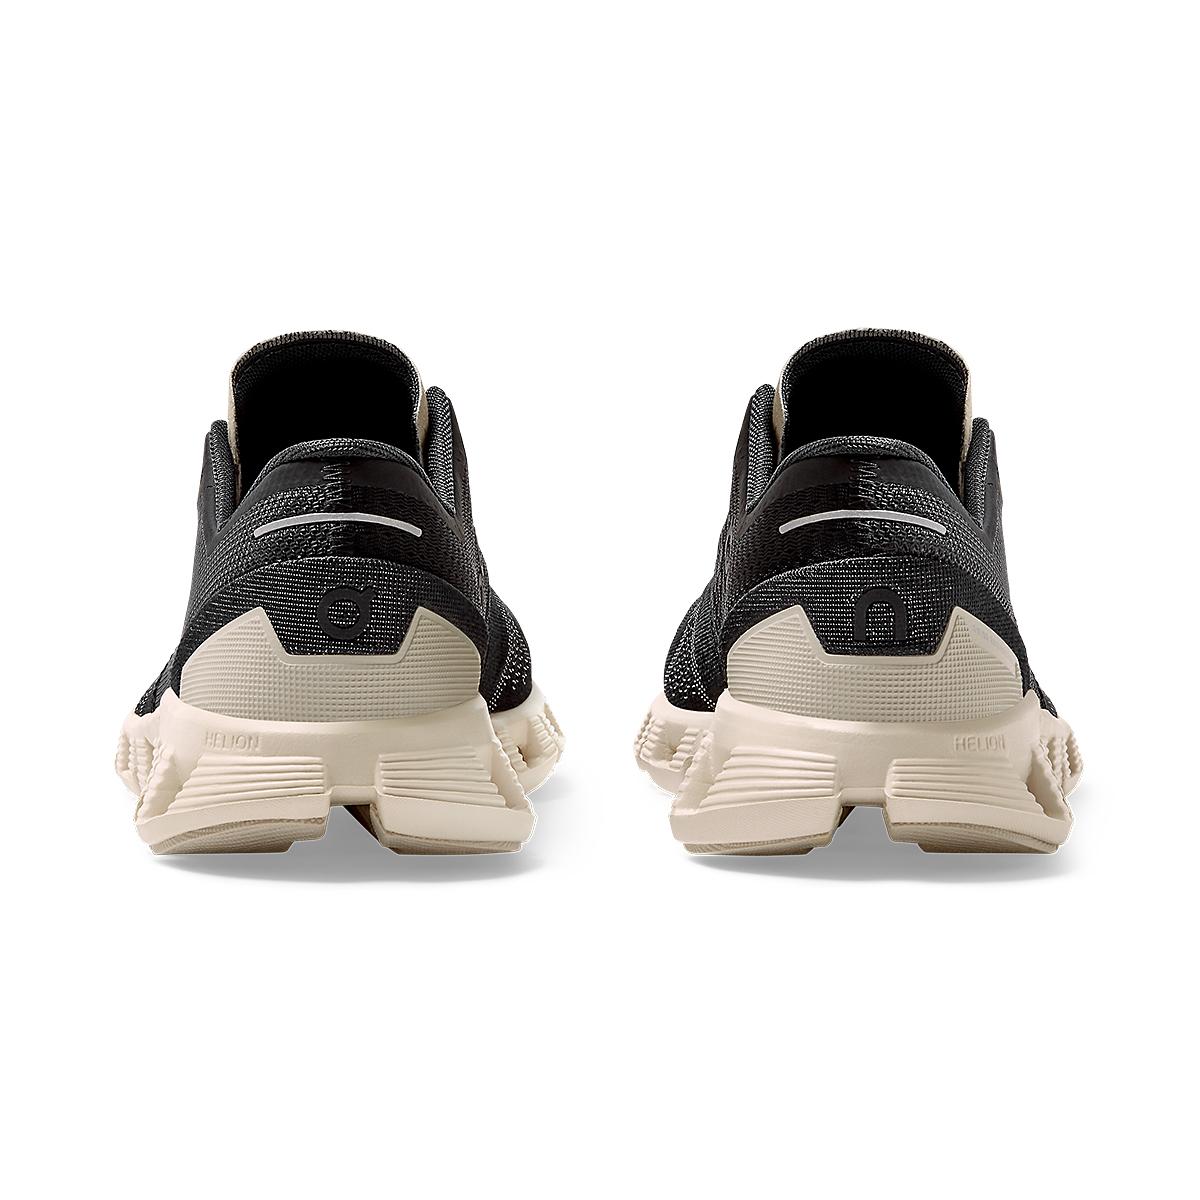 Women's On Cloud X 2.0 Running Shoe - Color: Black/Pearl - Size: 5 - Width: Regular, Black/Pearl, large, image 5